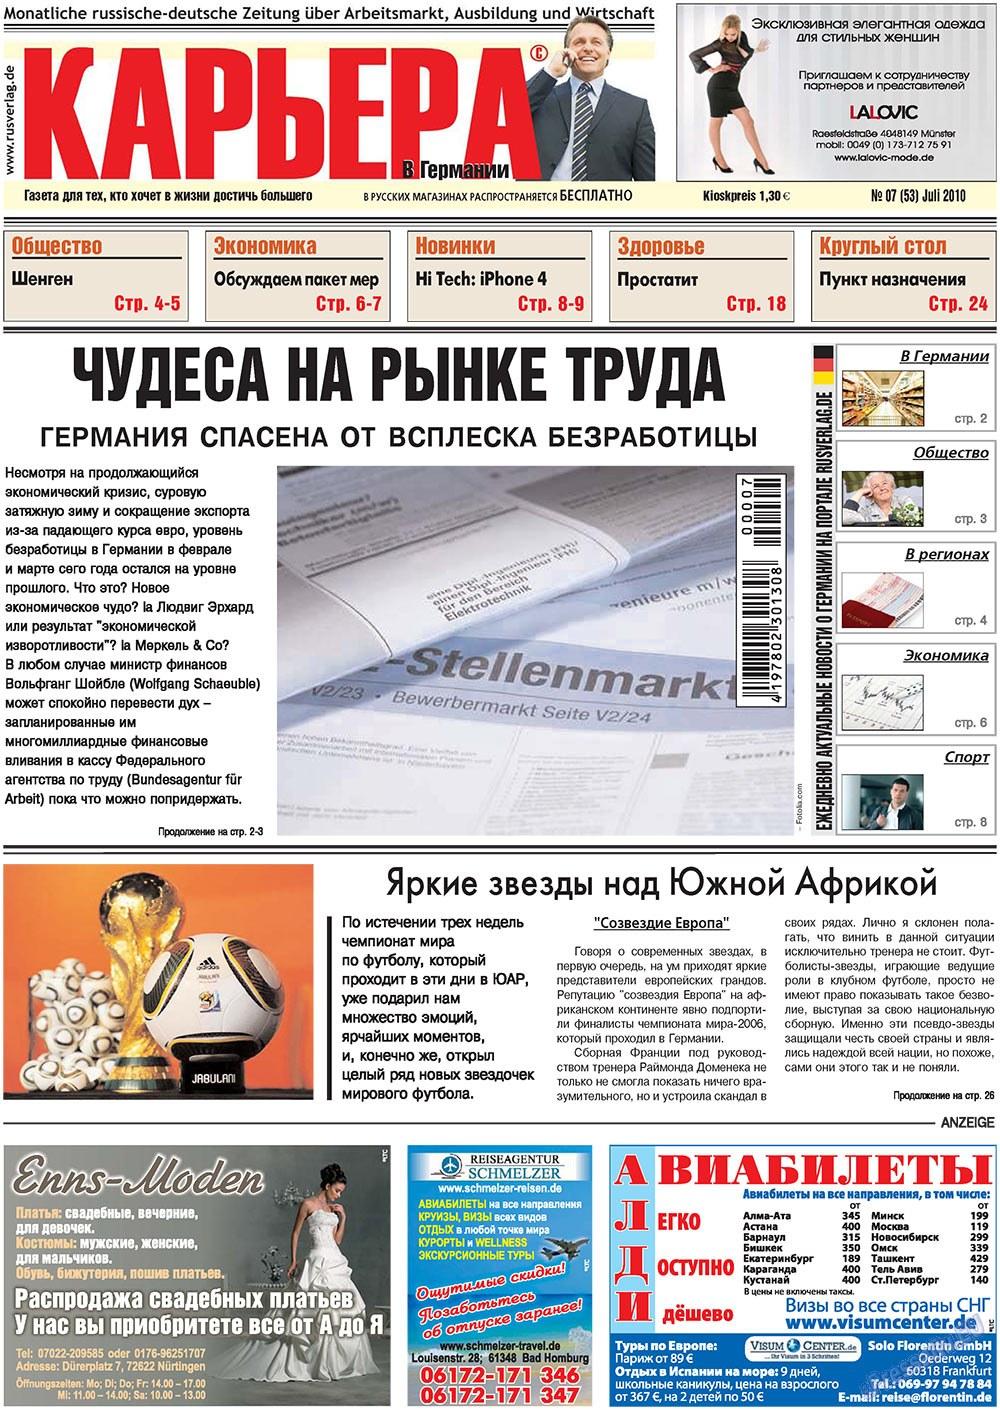 Карьера (газета). 2010 год, номер 7, стр. 1